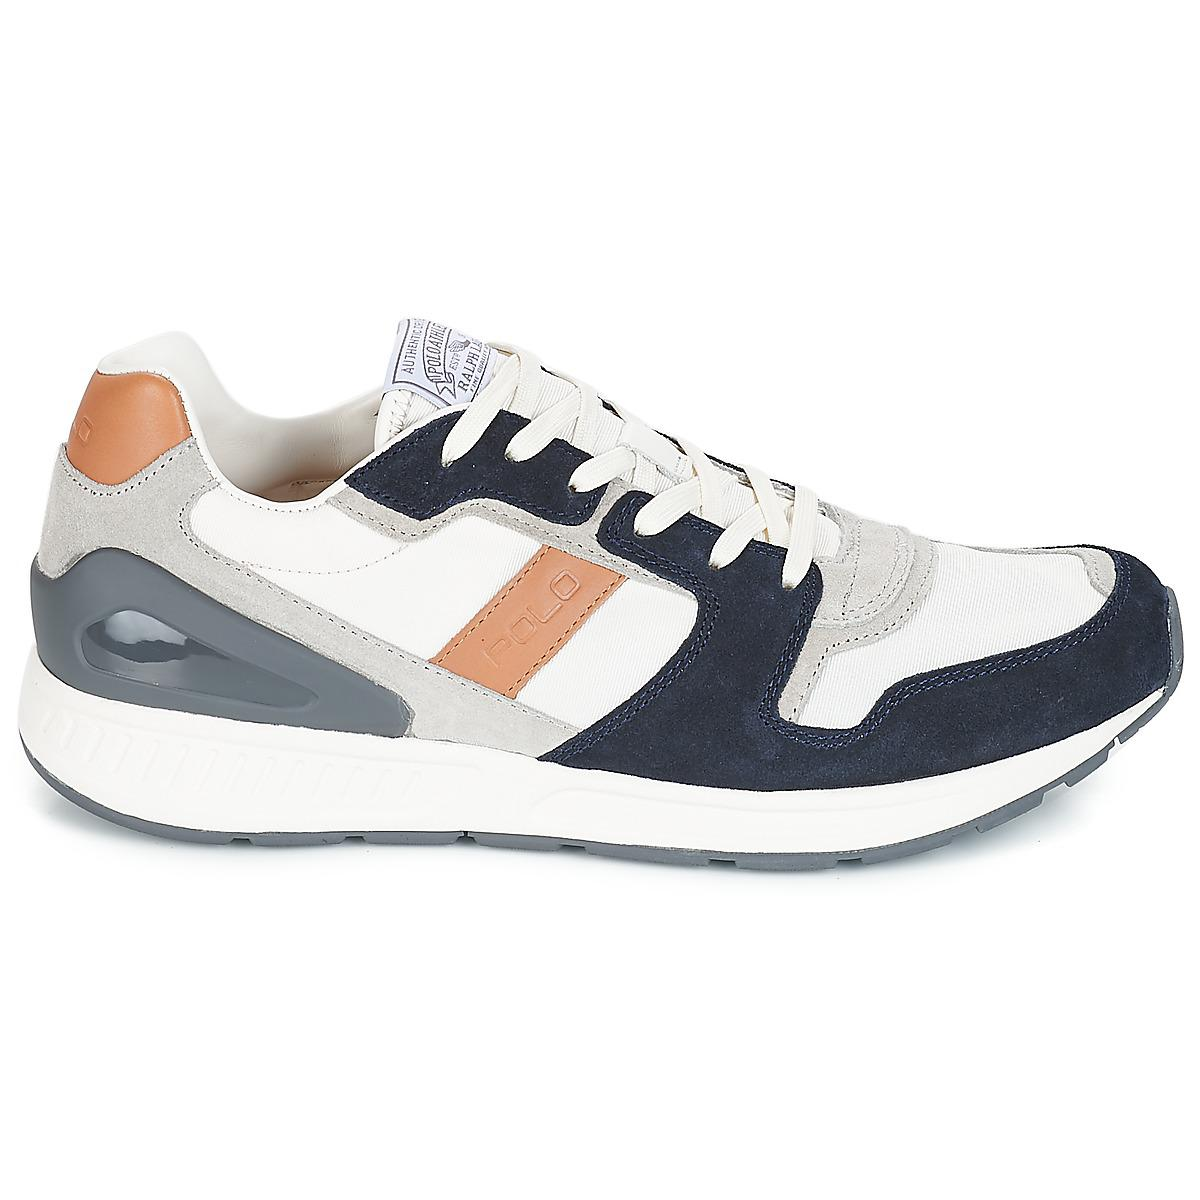 Polo Ralph Lauren - Gray Train 100 Cls Men s Shoes (trainers) In Grey for.  View fullscreen bddfa9cdcf9